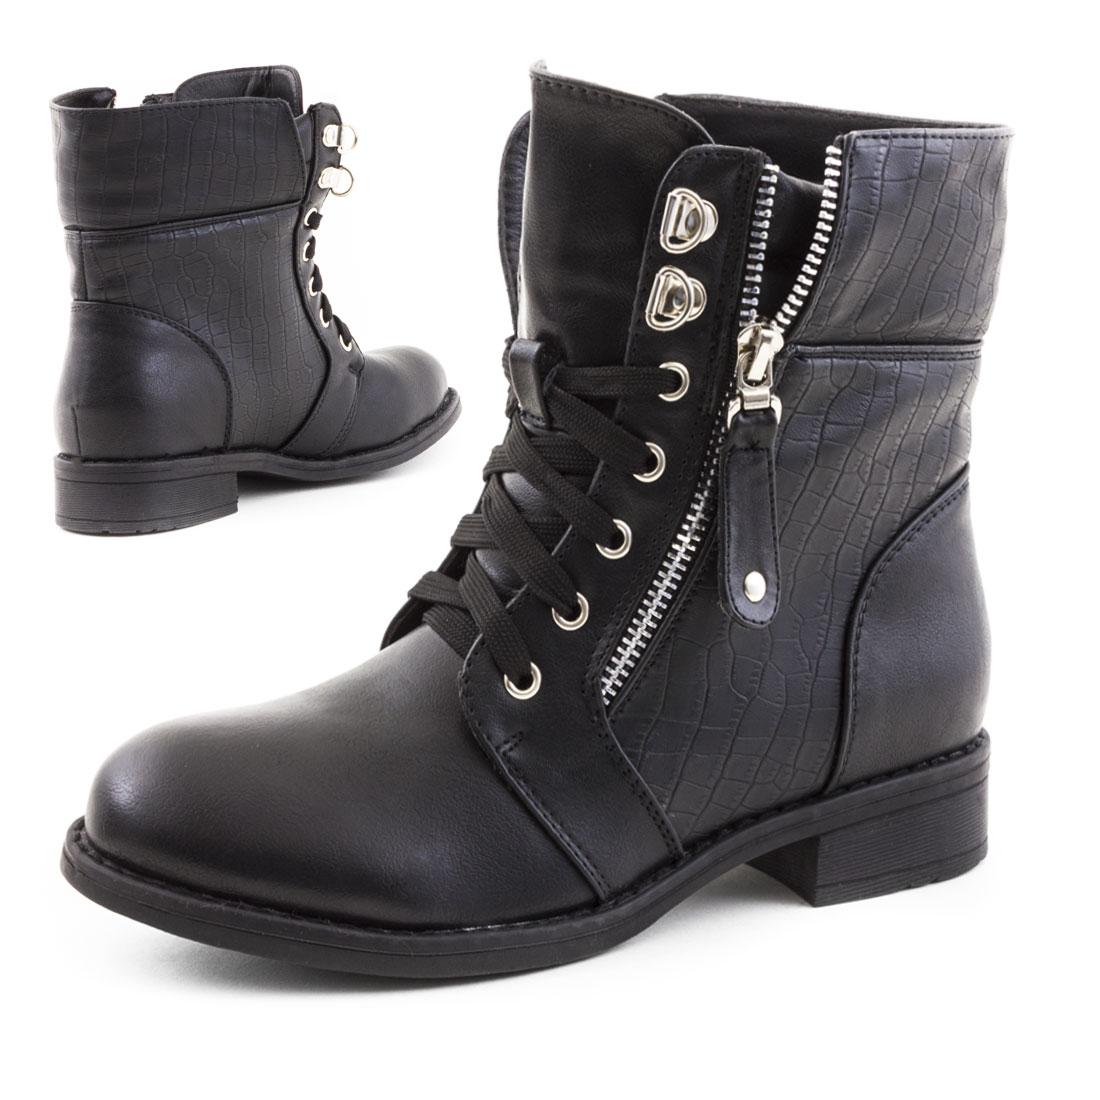 Schwarze Biker Boots (37,38,39,40)